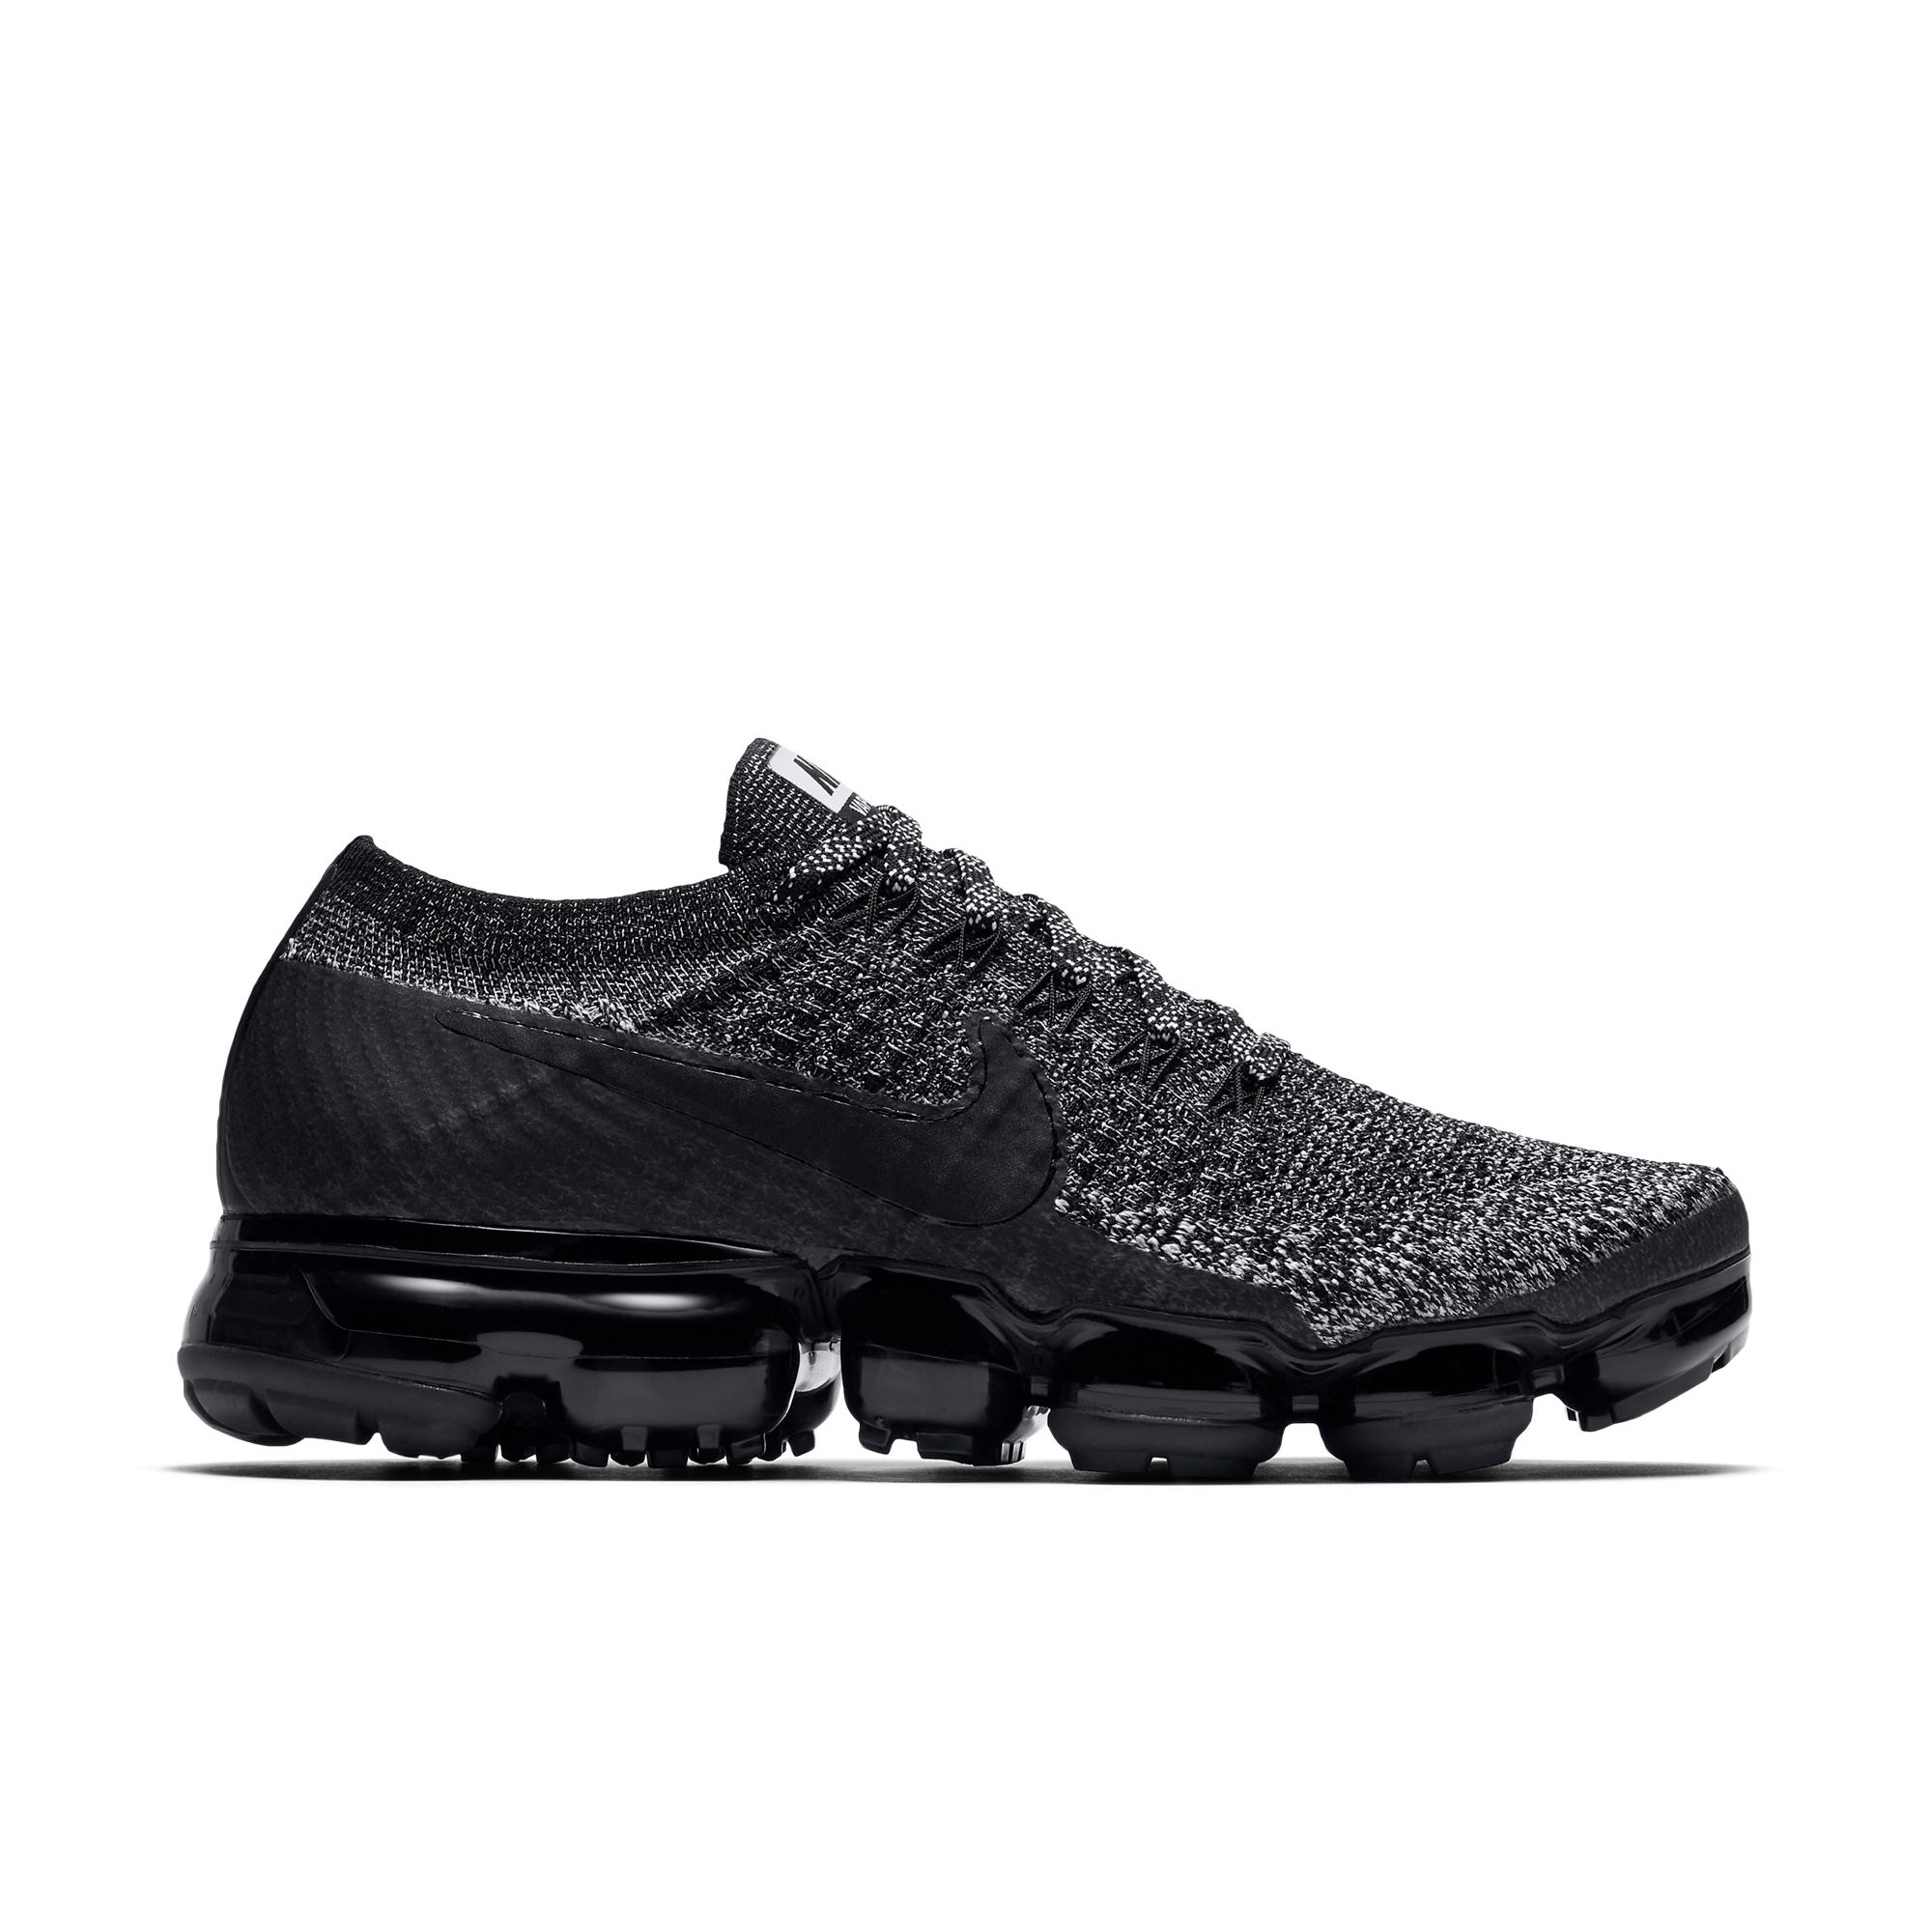 hibbett sports adidas shoes 2017 model adidas shoes women black leather